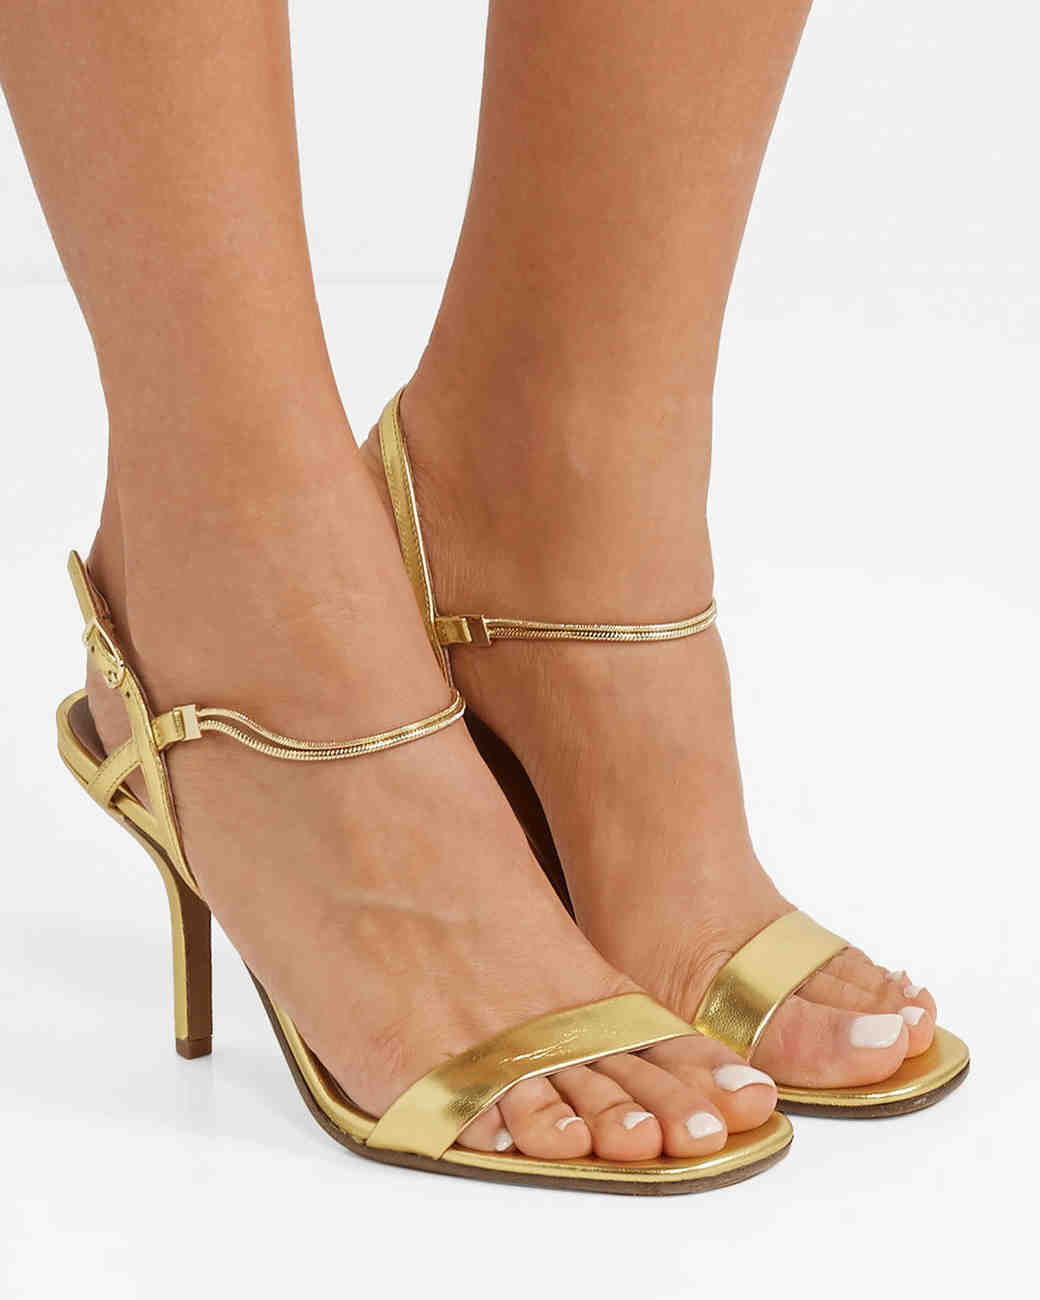 embellished metallic leather sandals bridesmaid shoes